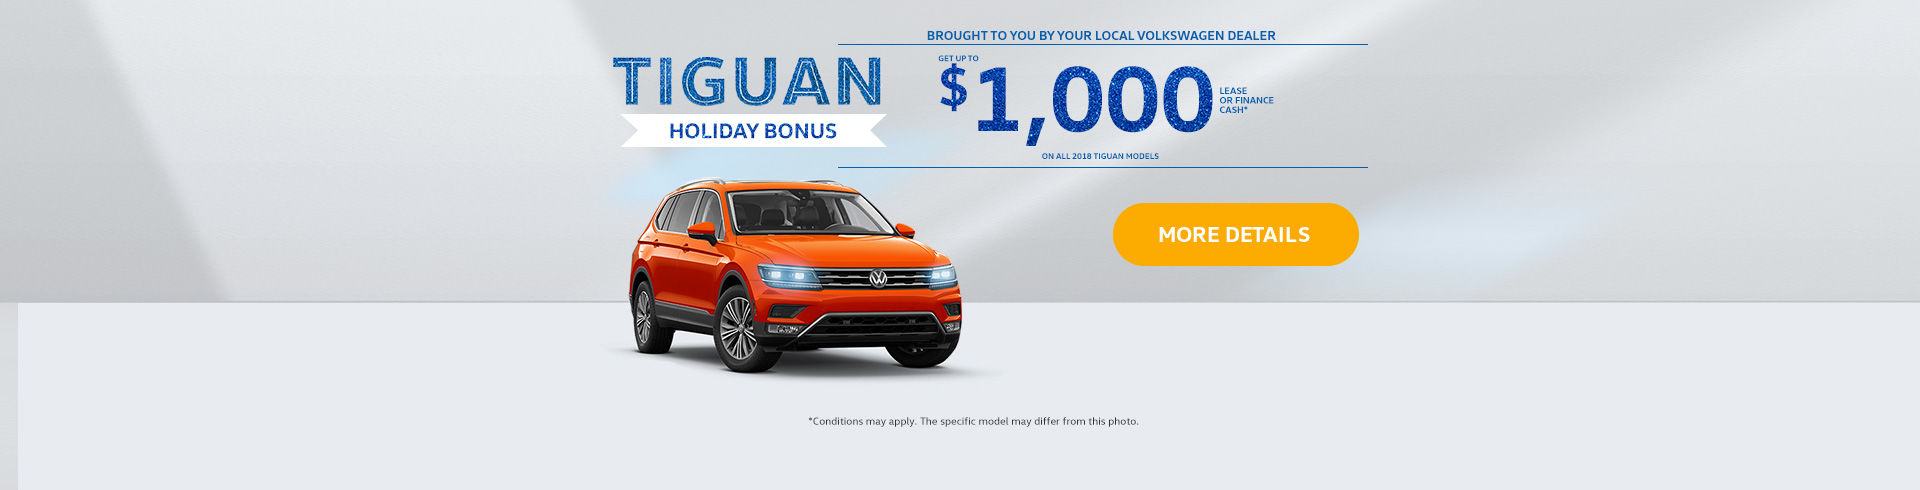 Tiguan Holiday Bonus!